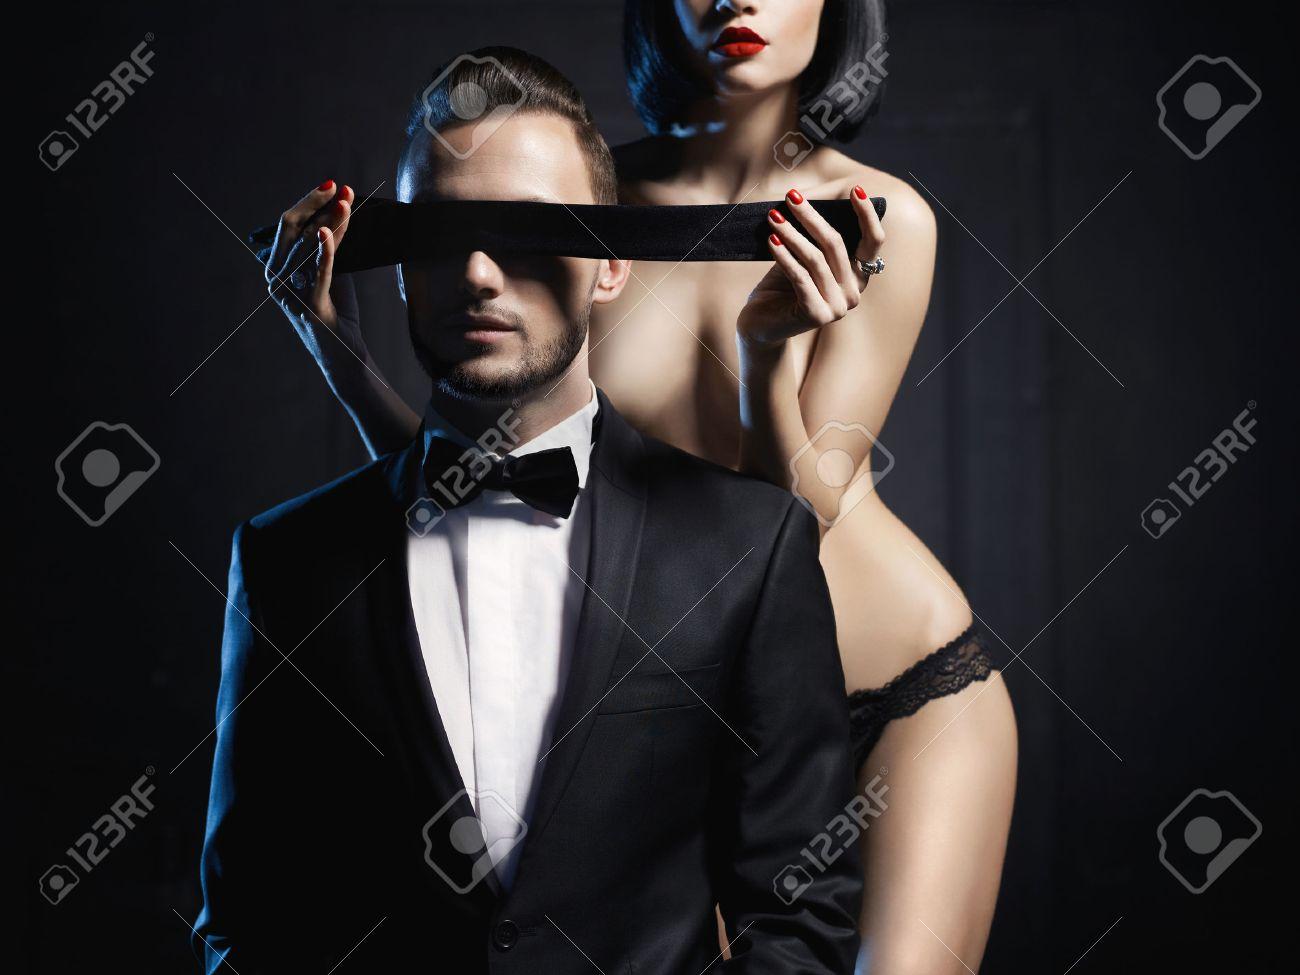 Fashion studio photo of a sensual couple in lingerie and a tuxedo Standard-Bild - 37539265